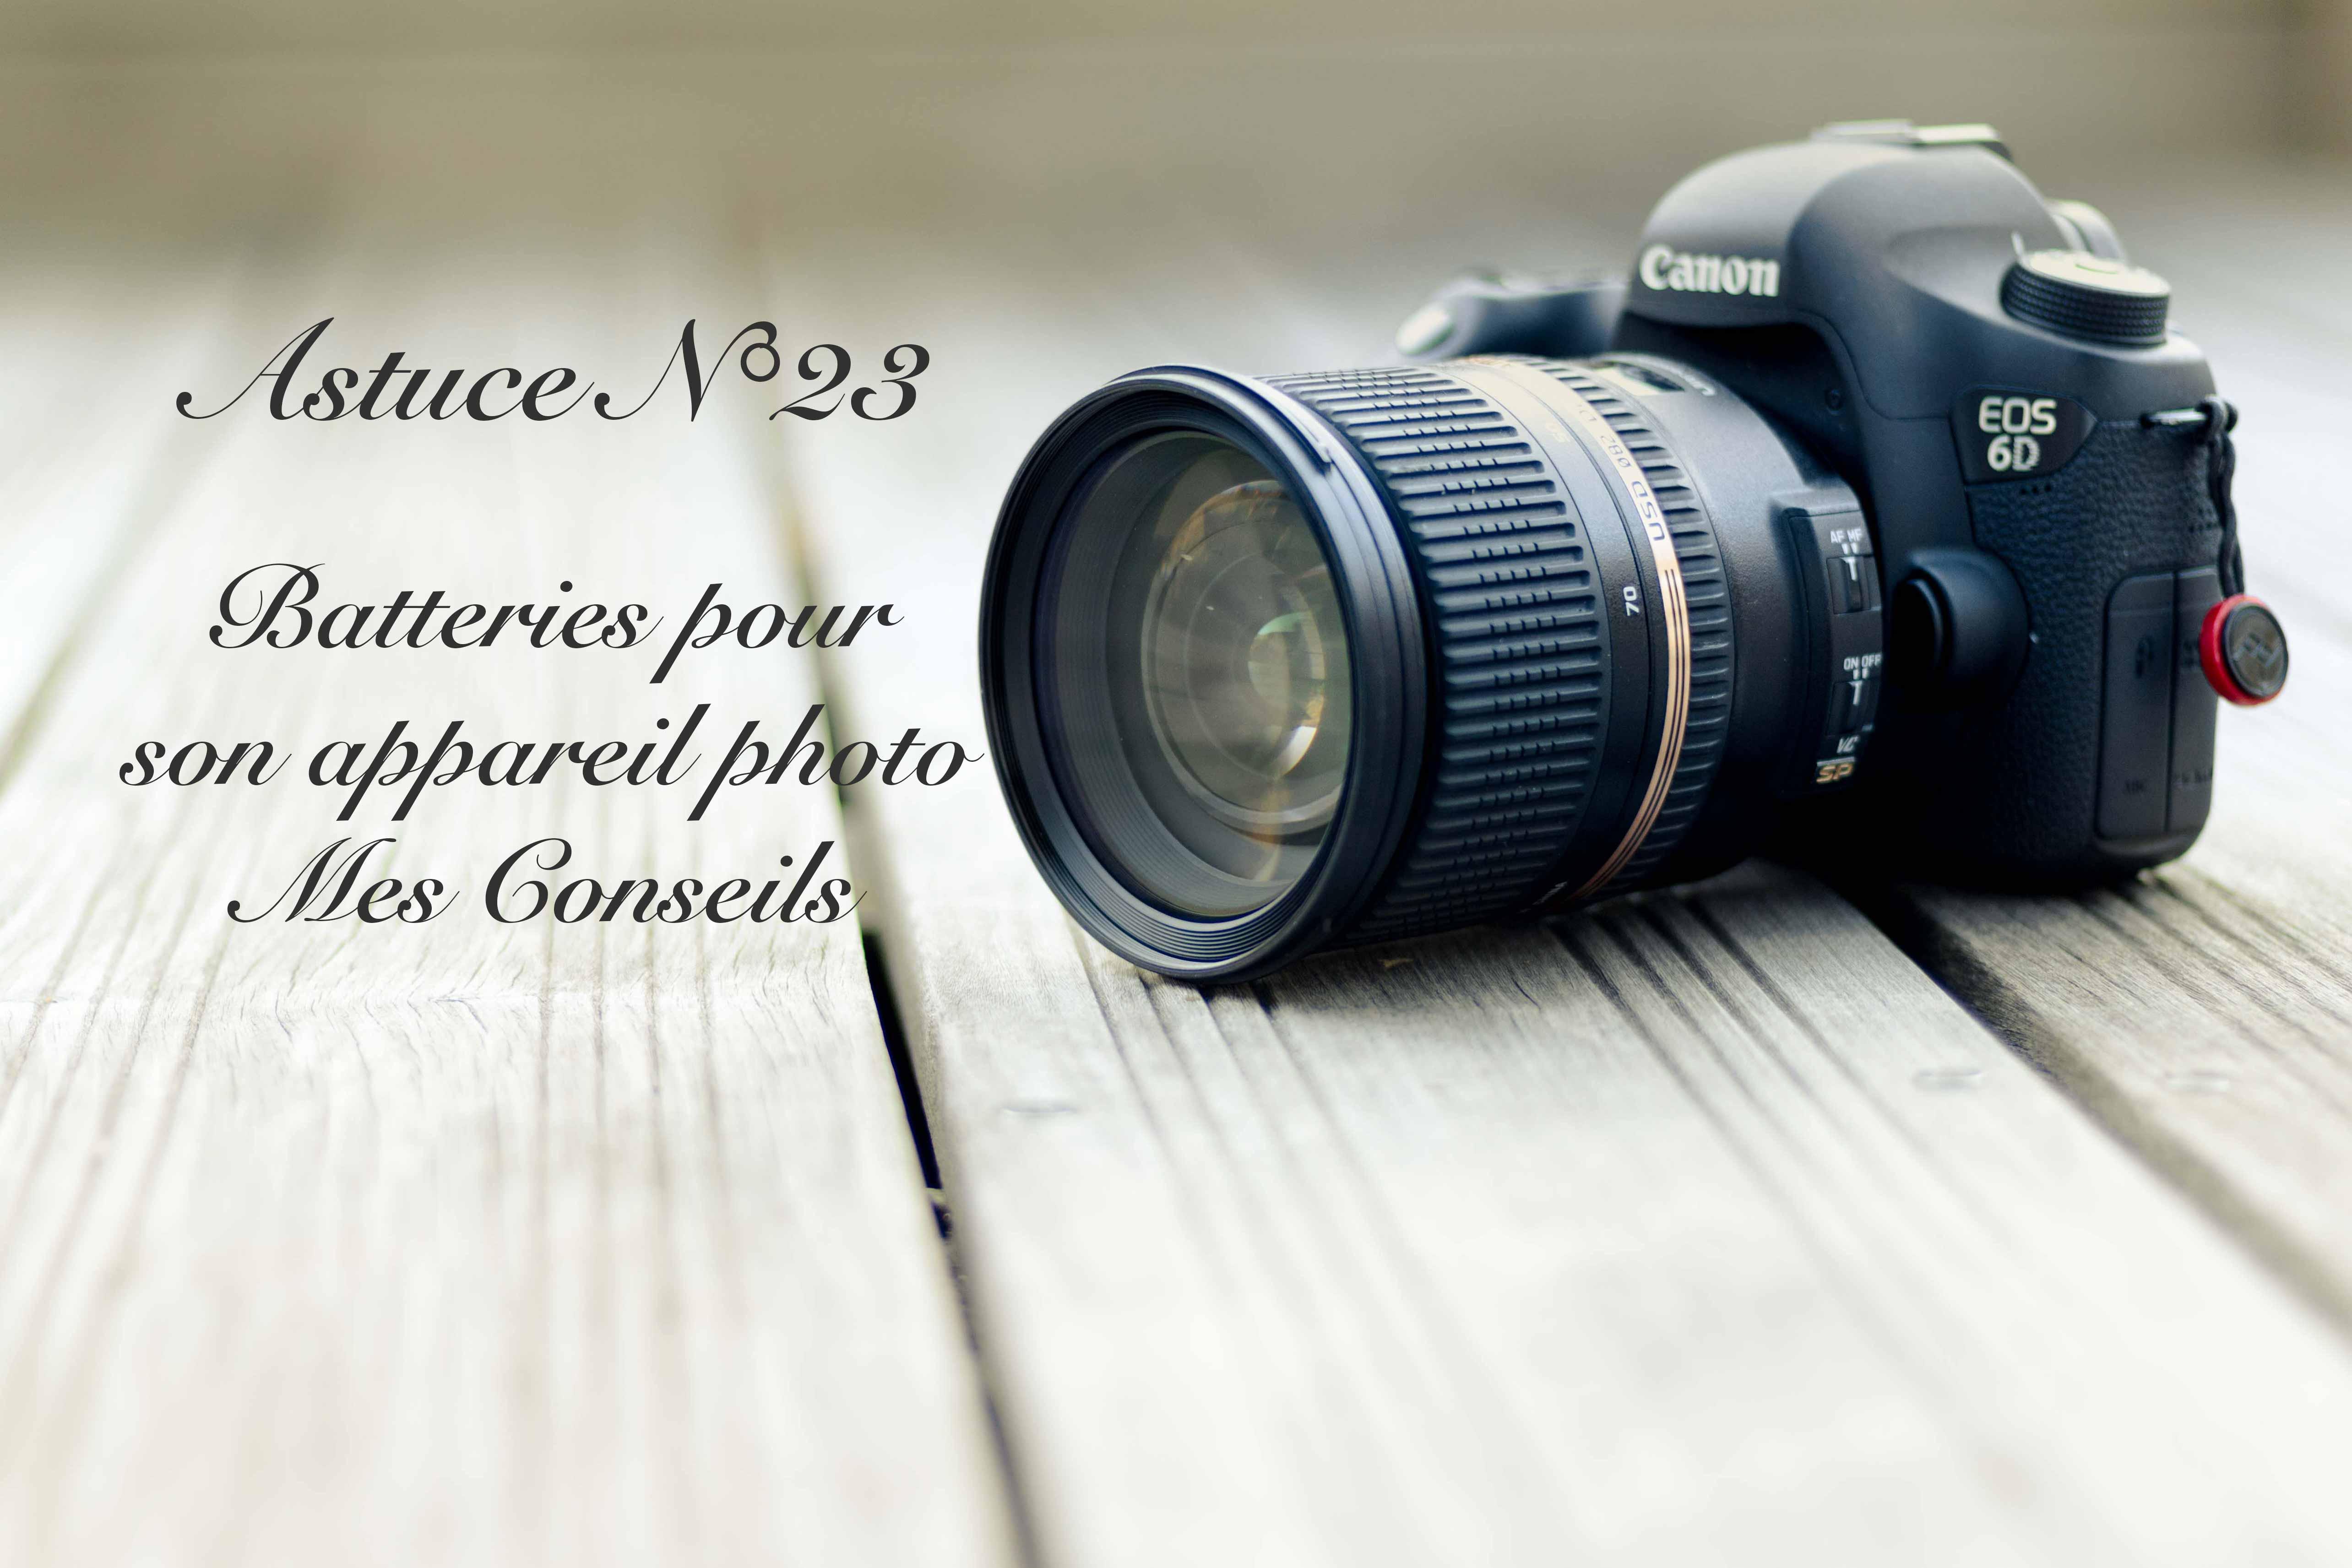 Batteries pour son appareil photo: bien choisir ! (23/52)